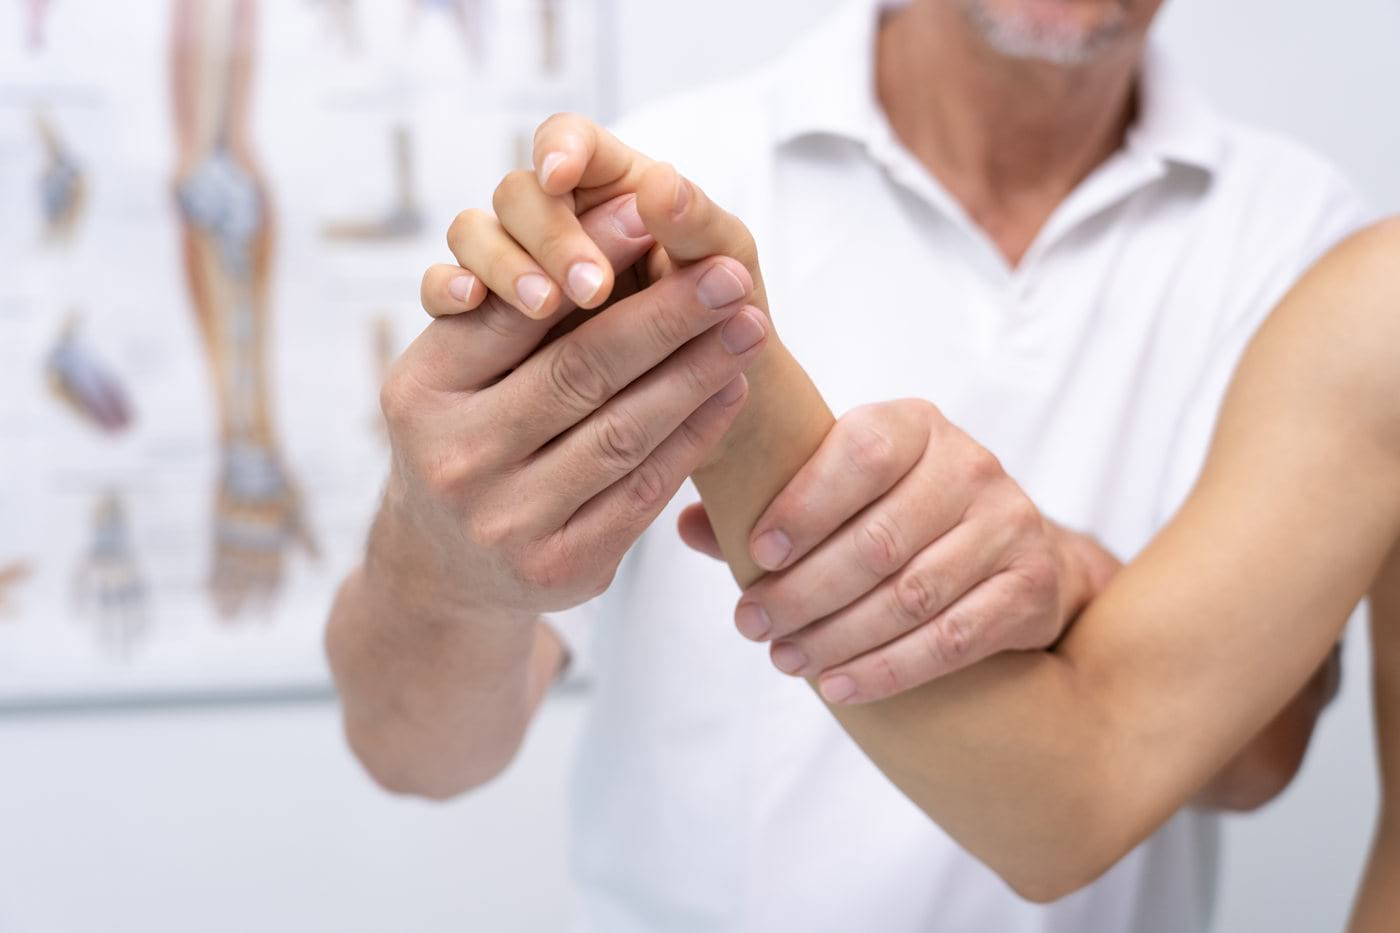 Noutati in tratamentul artrozei: managementul durerii si redarea mobilitatii